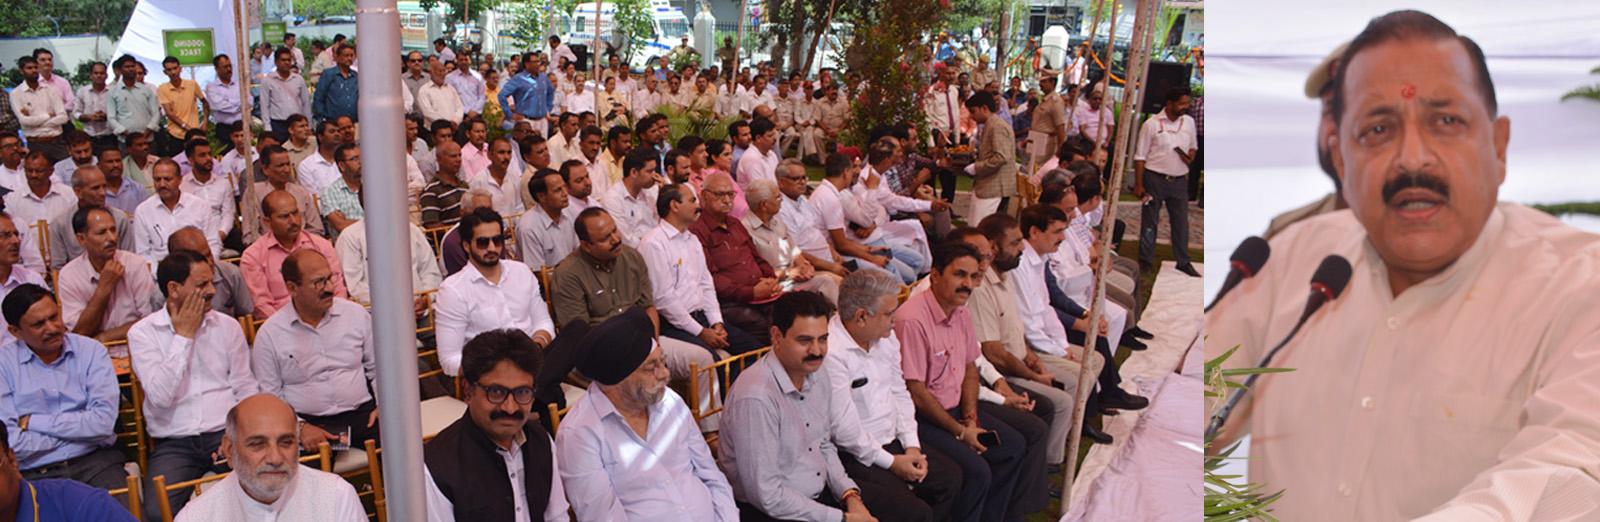 Union Minister Dr Jitendra Singh addressing a public gathering at Kathua on Monday.